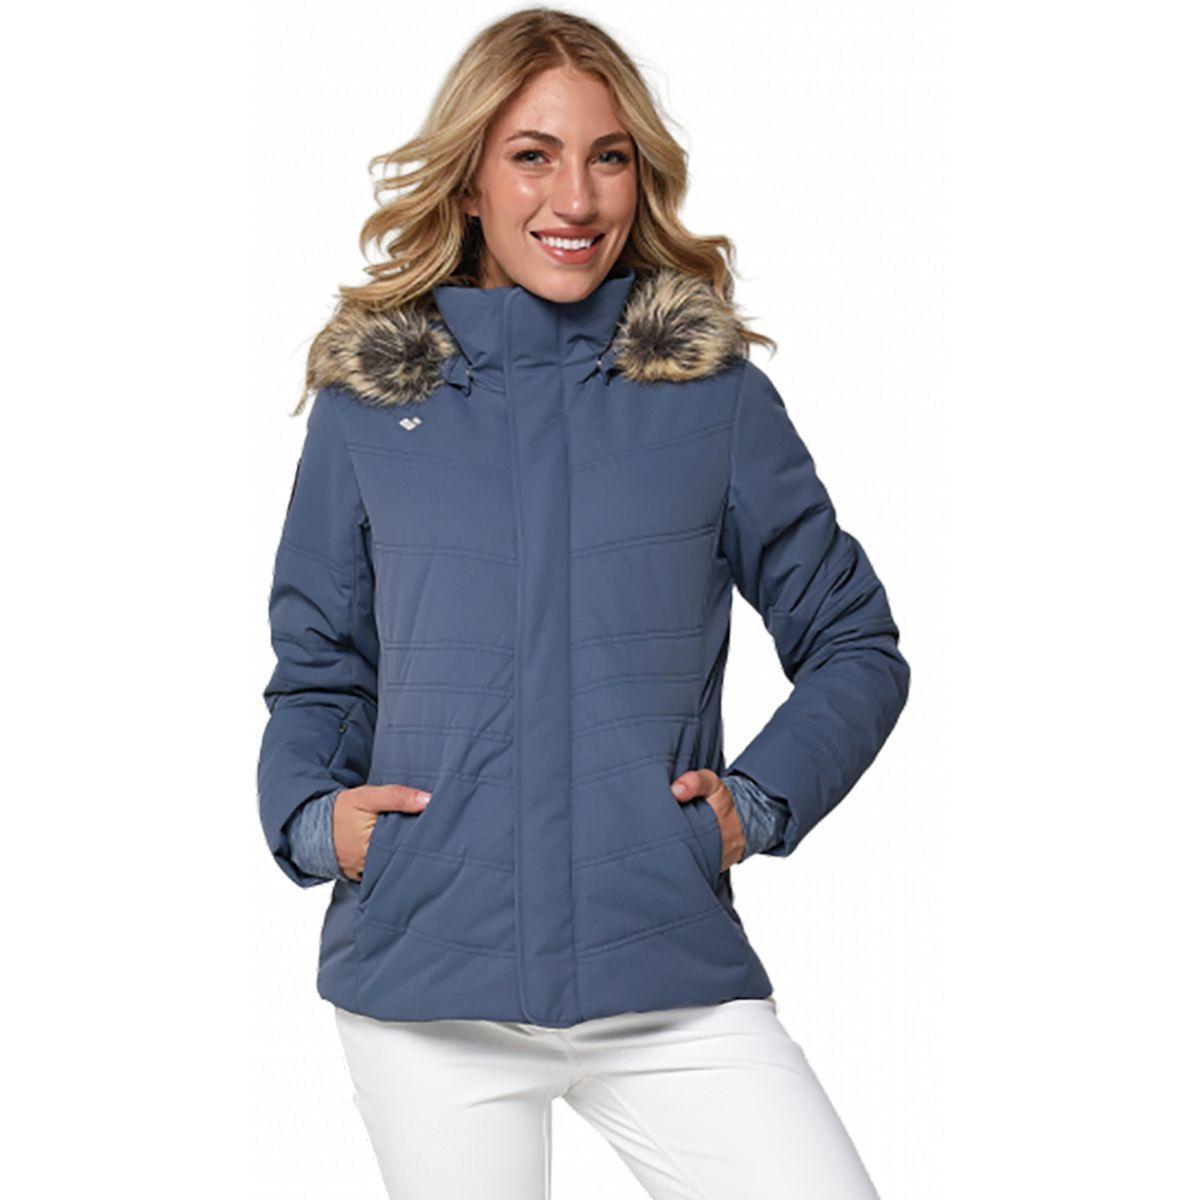 Obermeyer Tuscany II Insulated Jacket - Women's